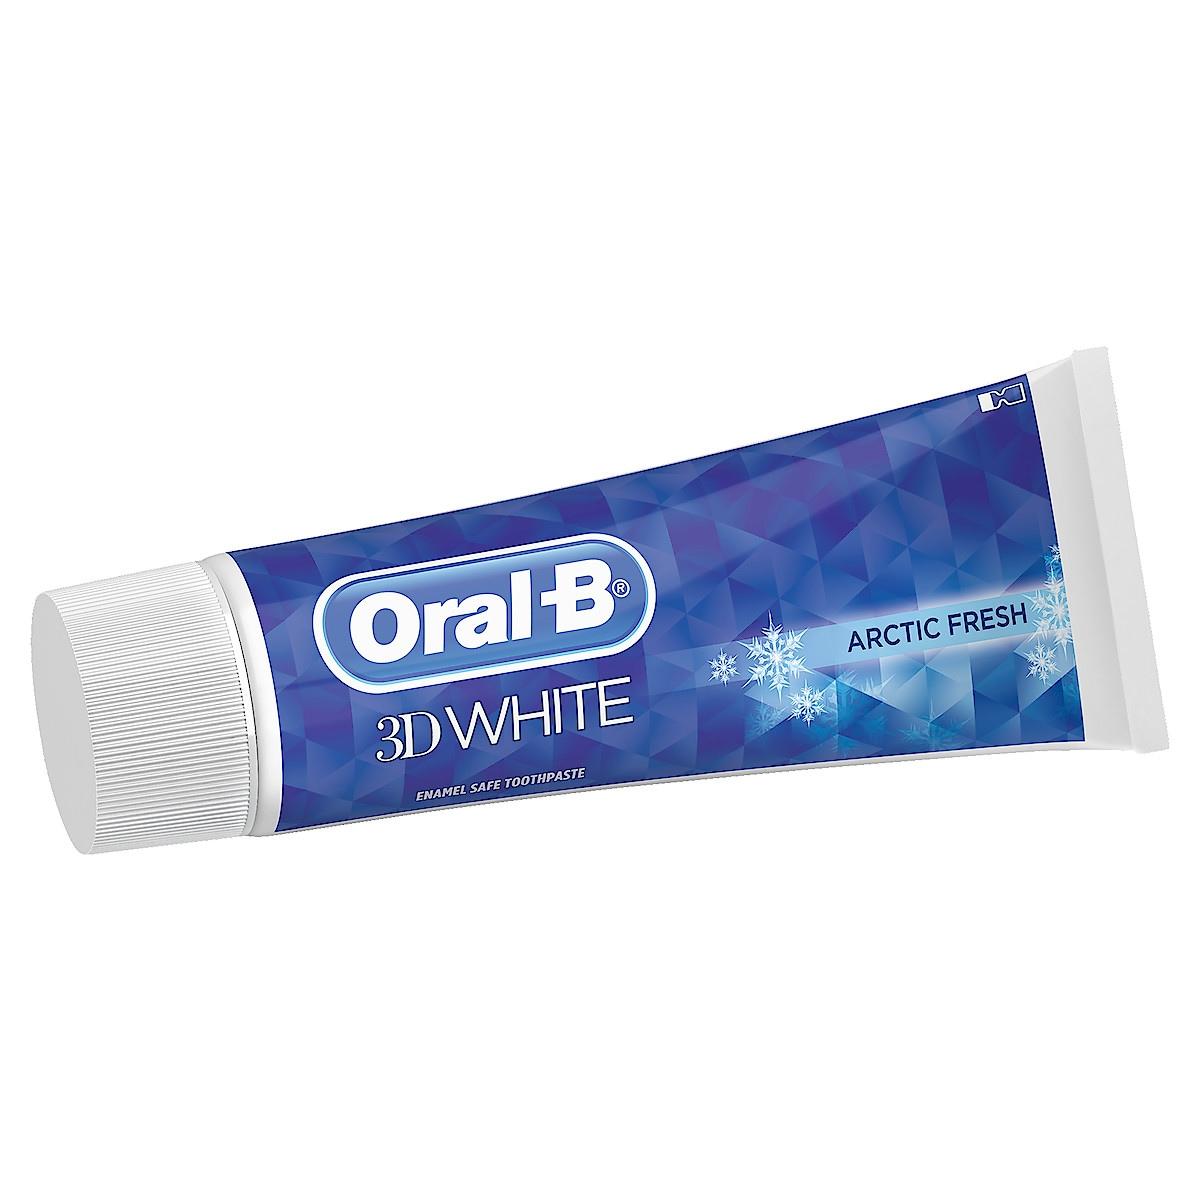 Tandkräm Oral-B 3D White Arctic Fresh